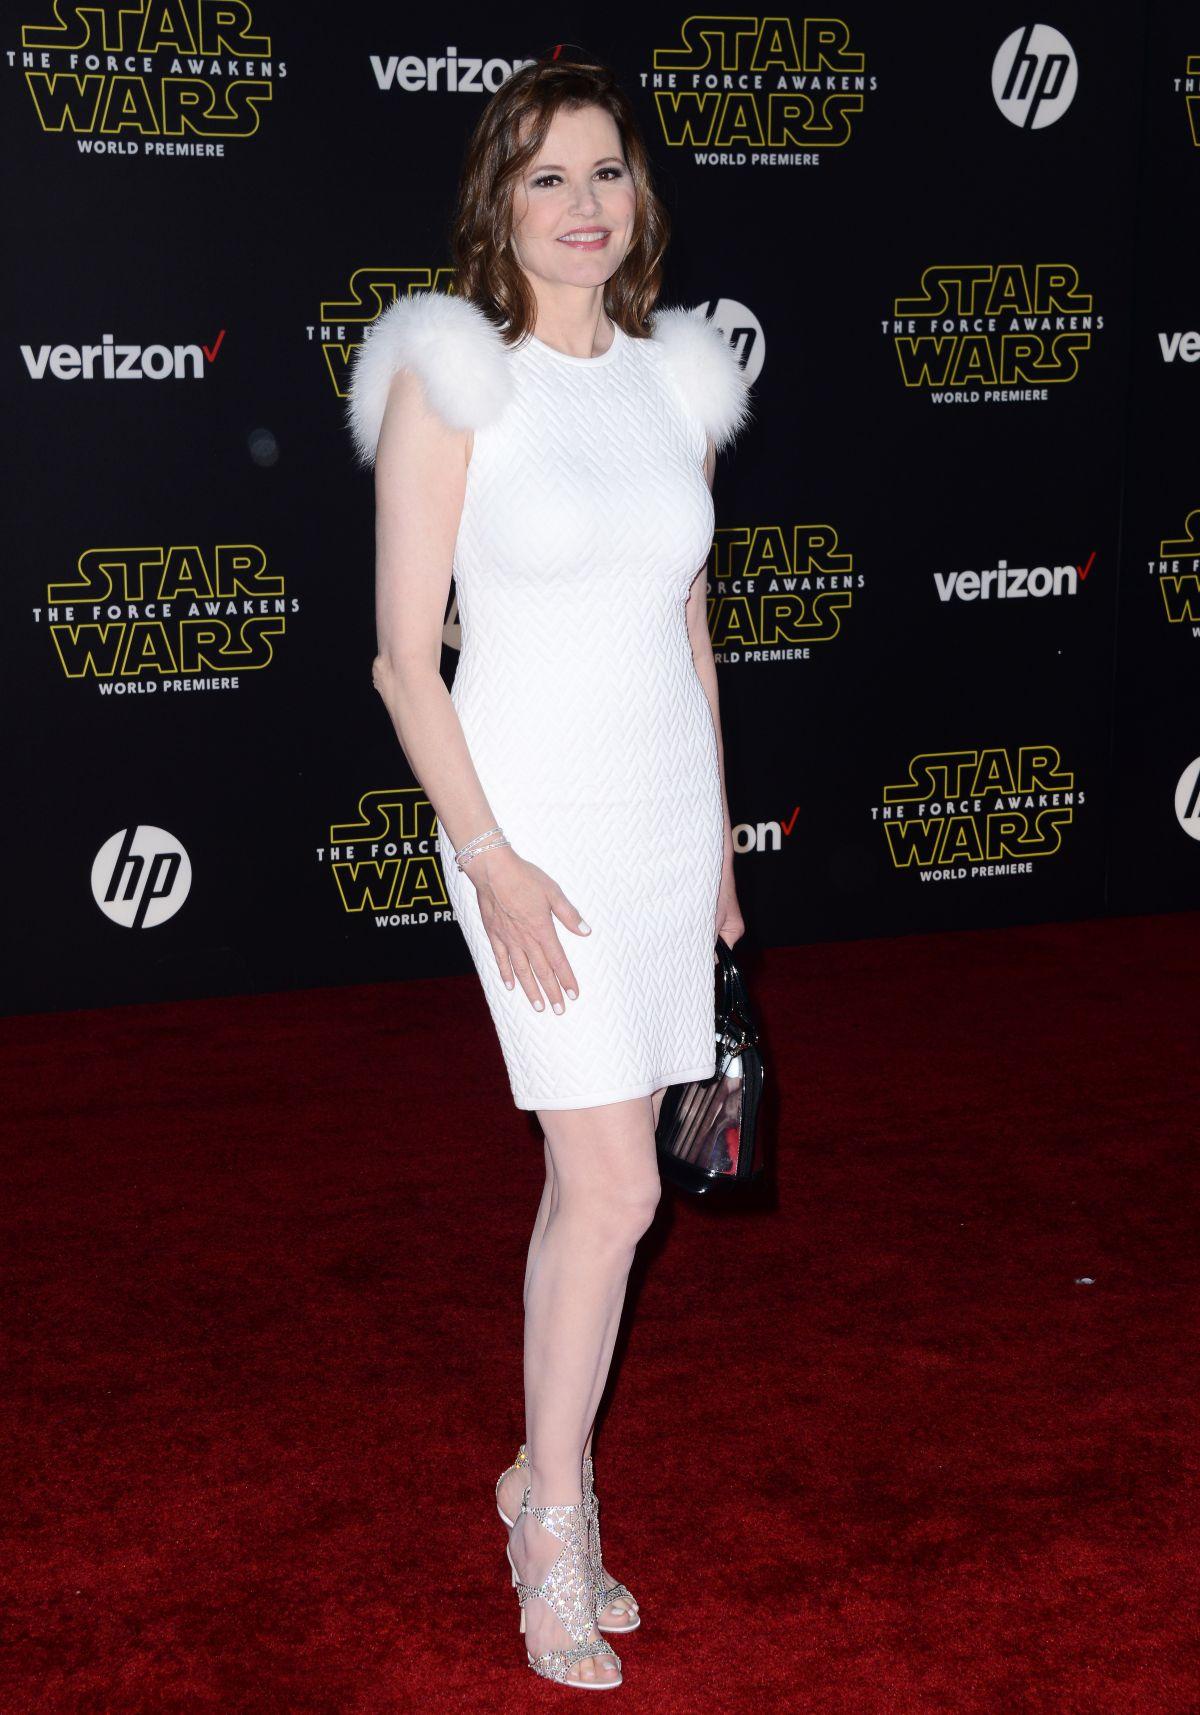 GEENA DAVIS at Star Wars: Episode VII – The Force Awakens Premiere in Hollywood 12/14/2015